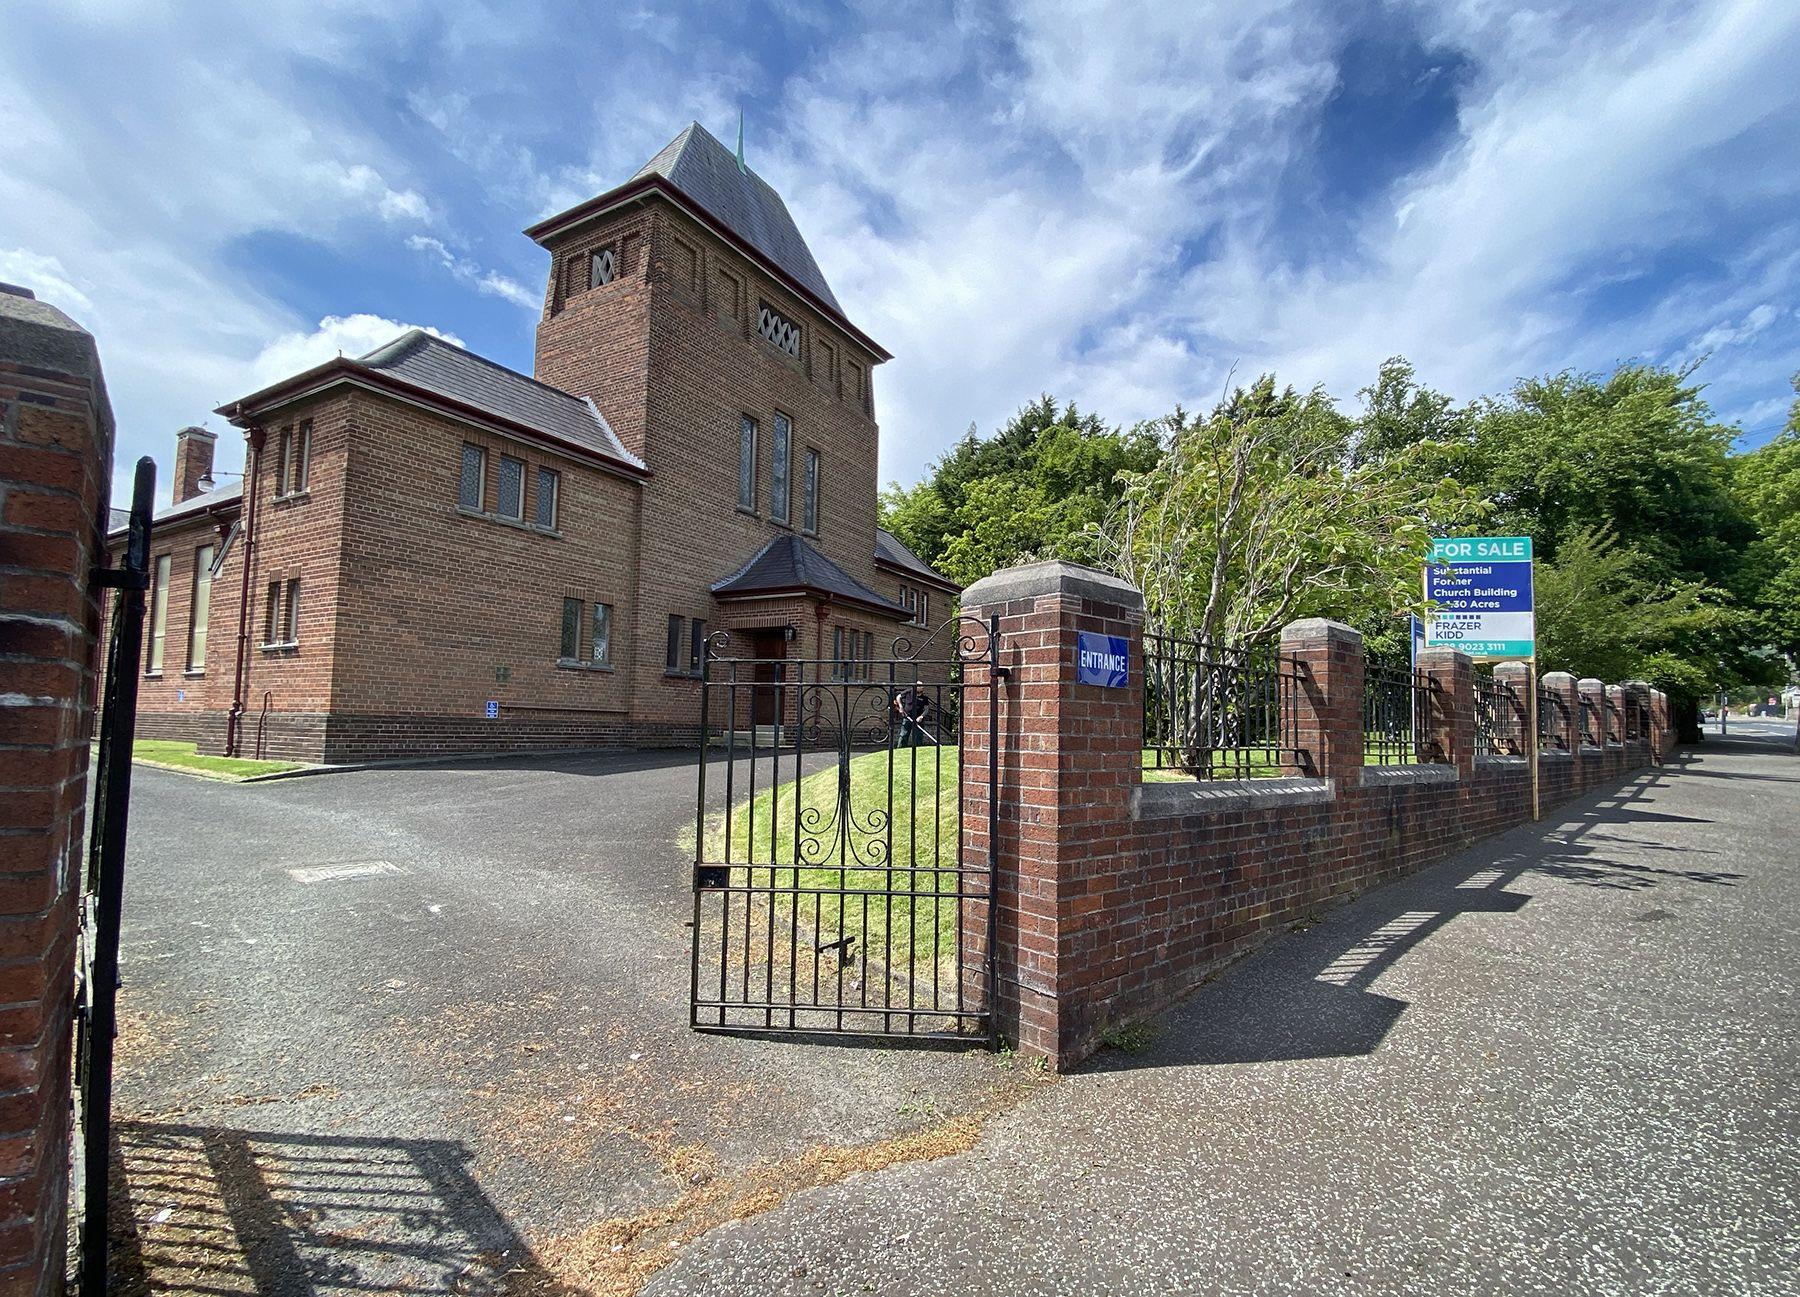 UP FOR SALE: Cavehill Methodist Church